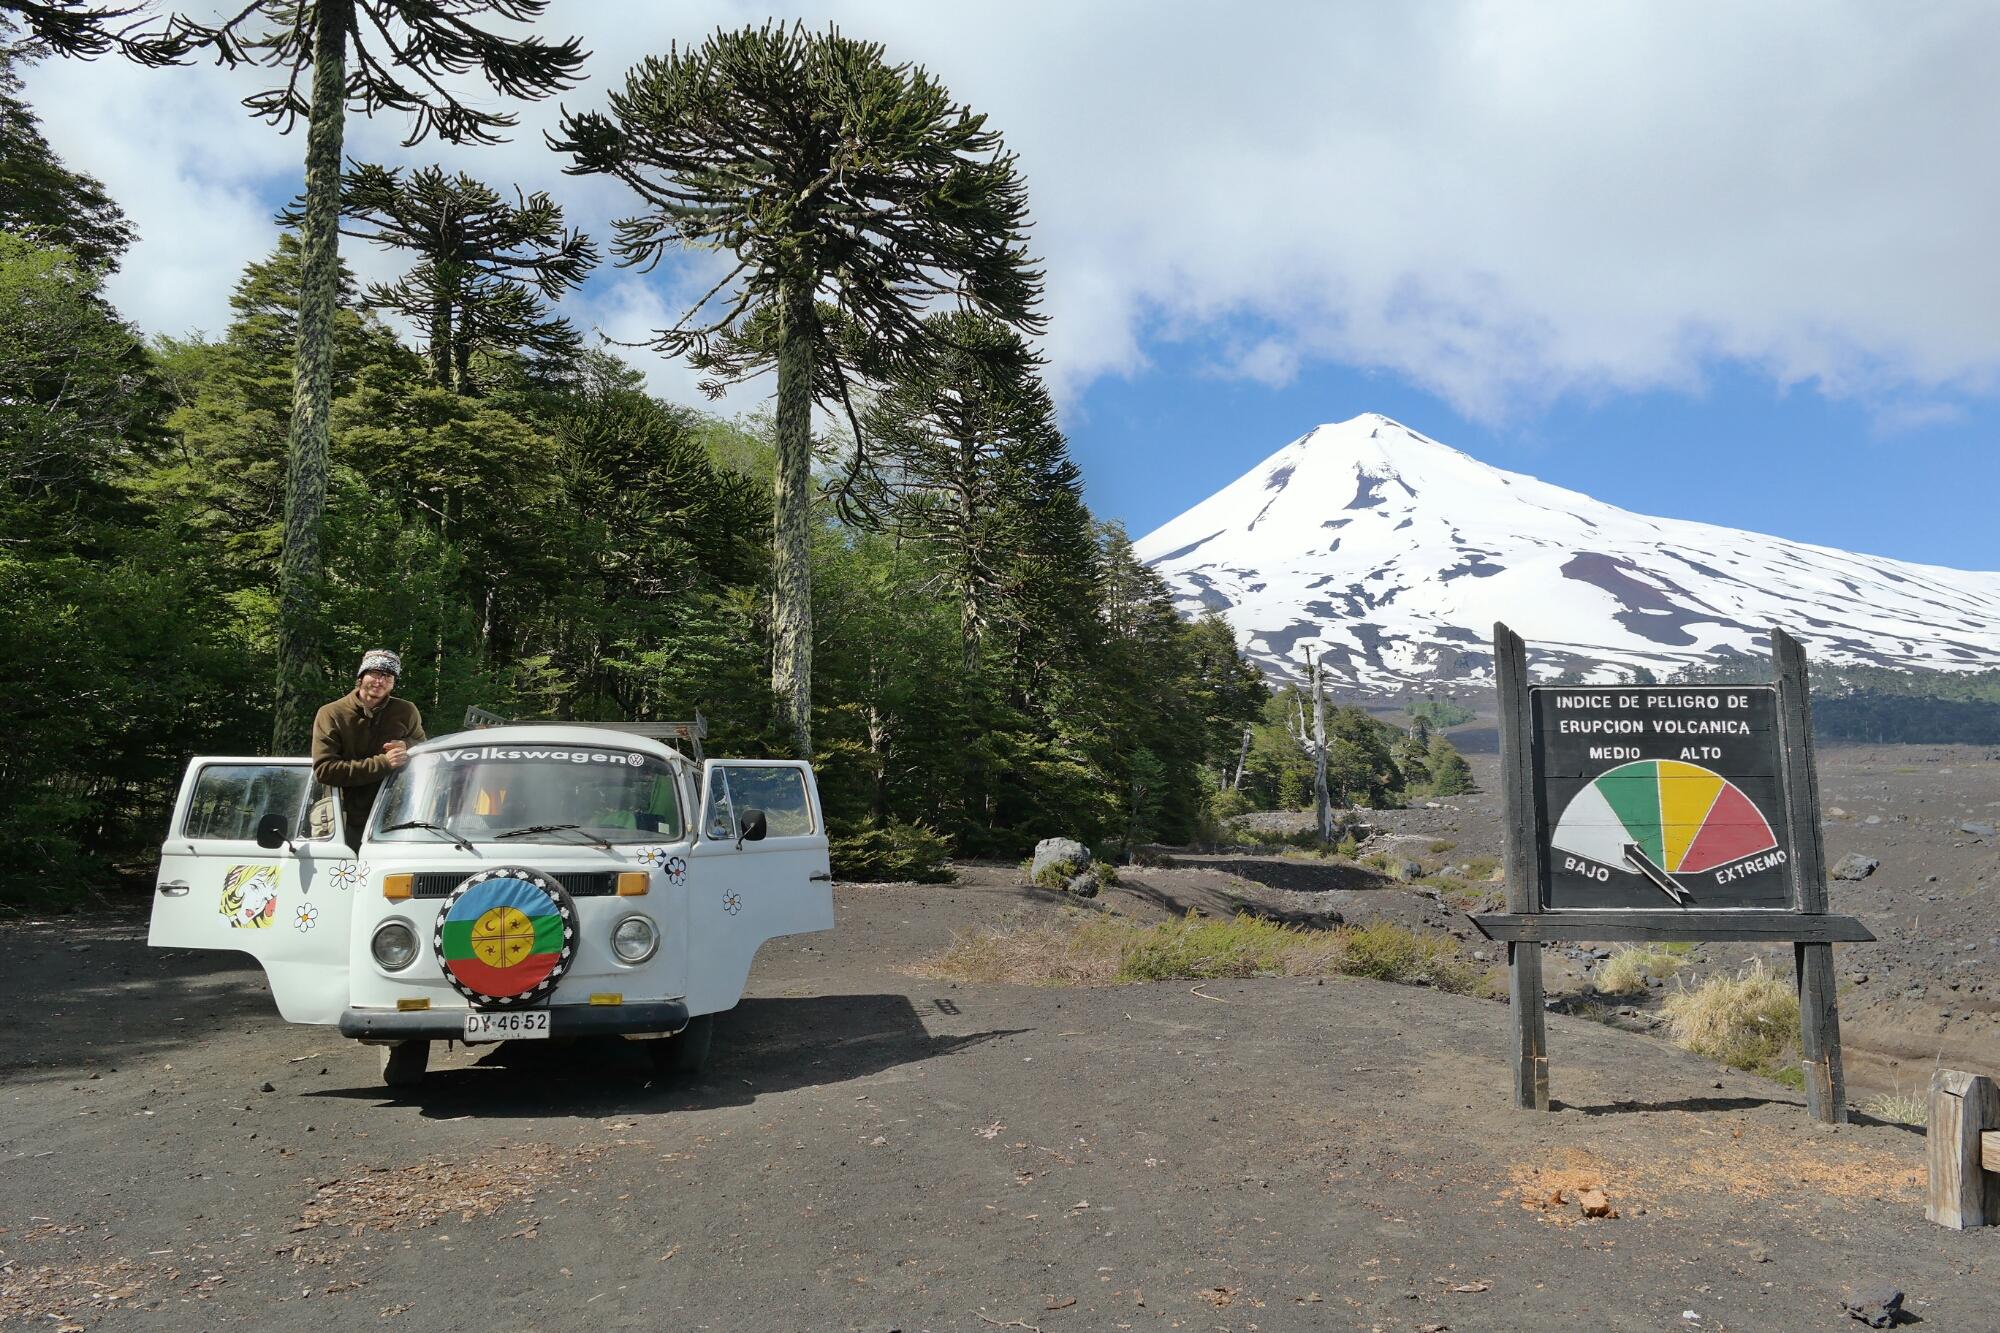 salomon x aventure - Acheter un van au Chili \u2013 Pisco Rando